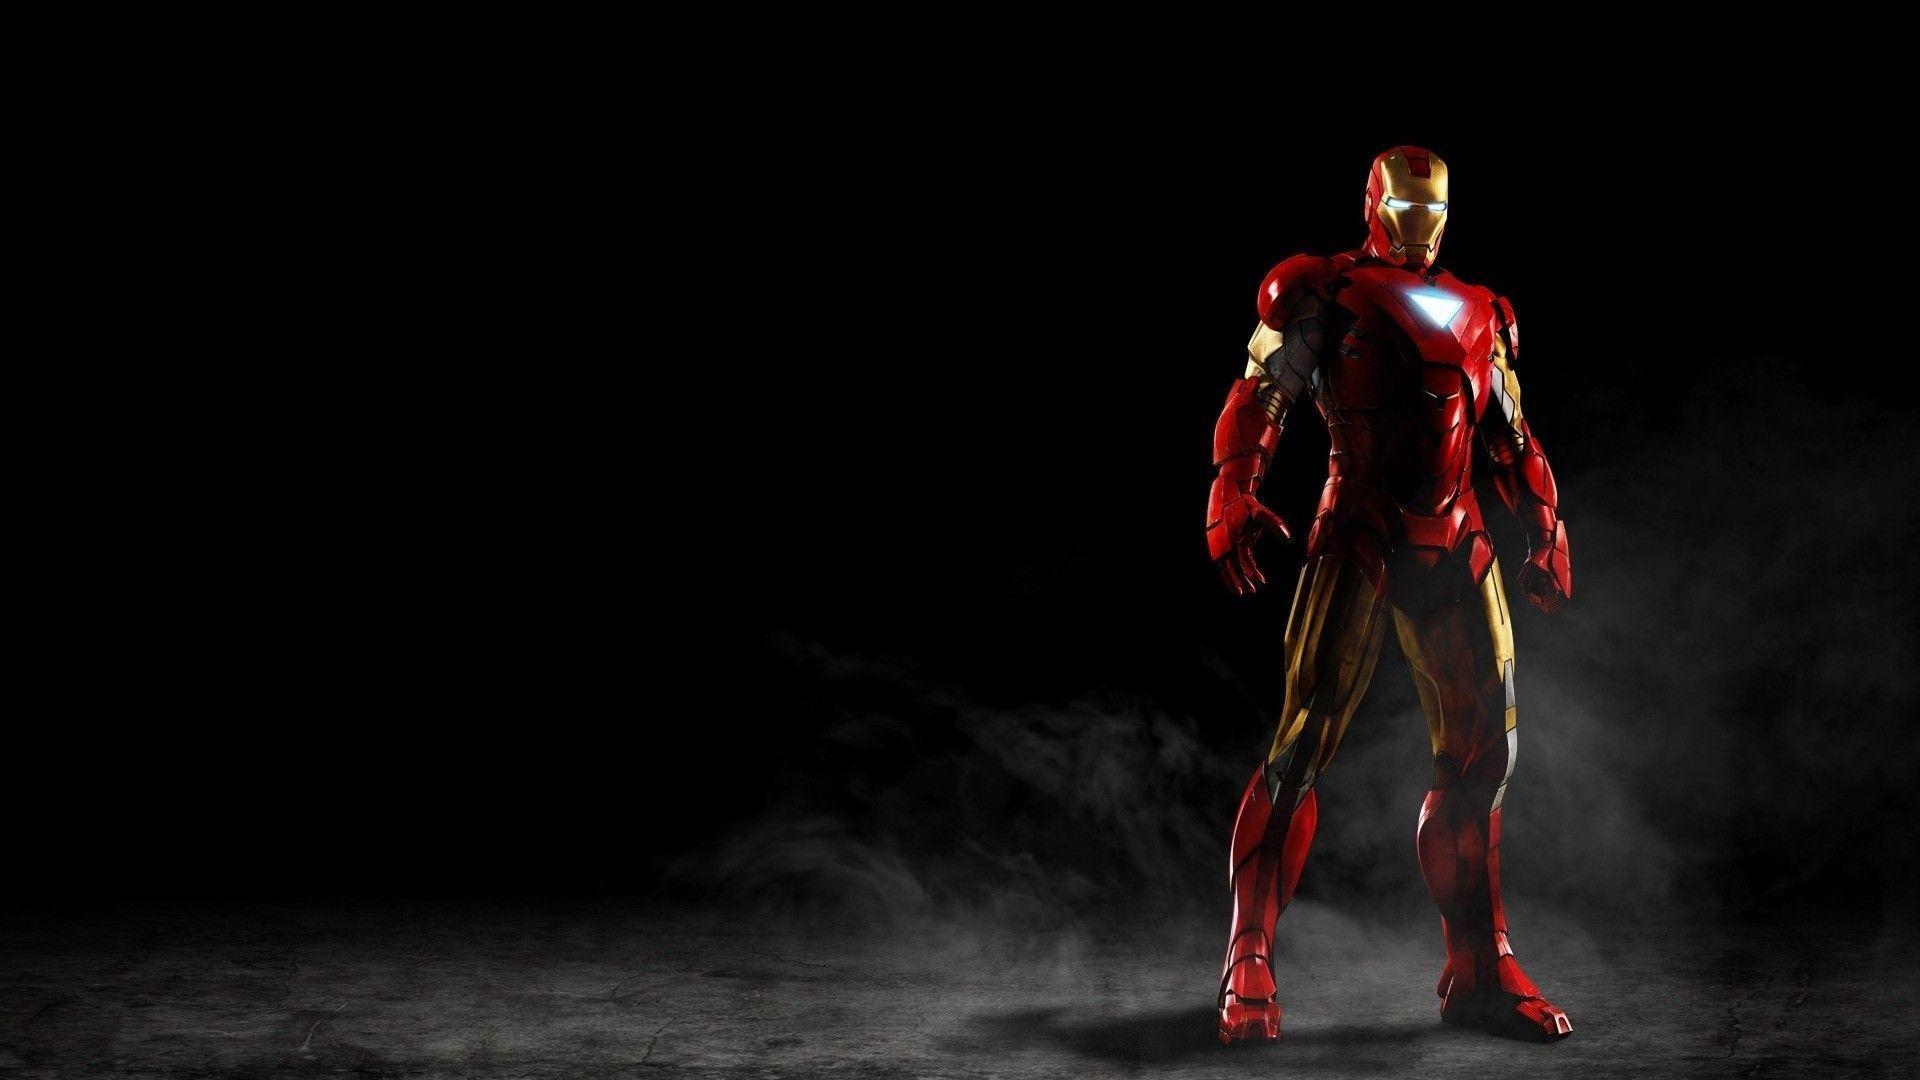 Iron Man Wallpapers - Top Free Iron Man Backgrounds - WallpaperAccess